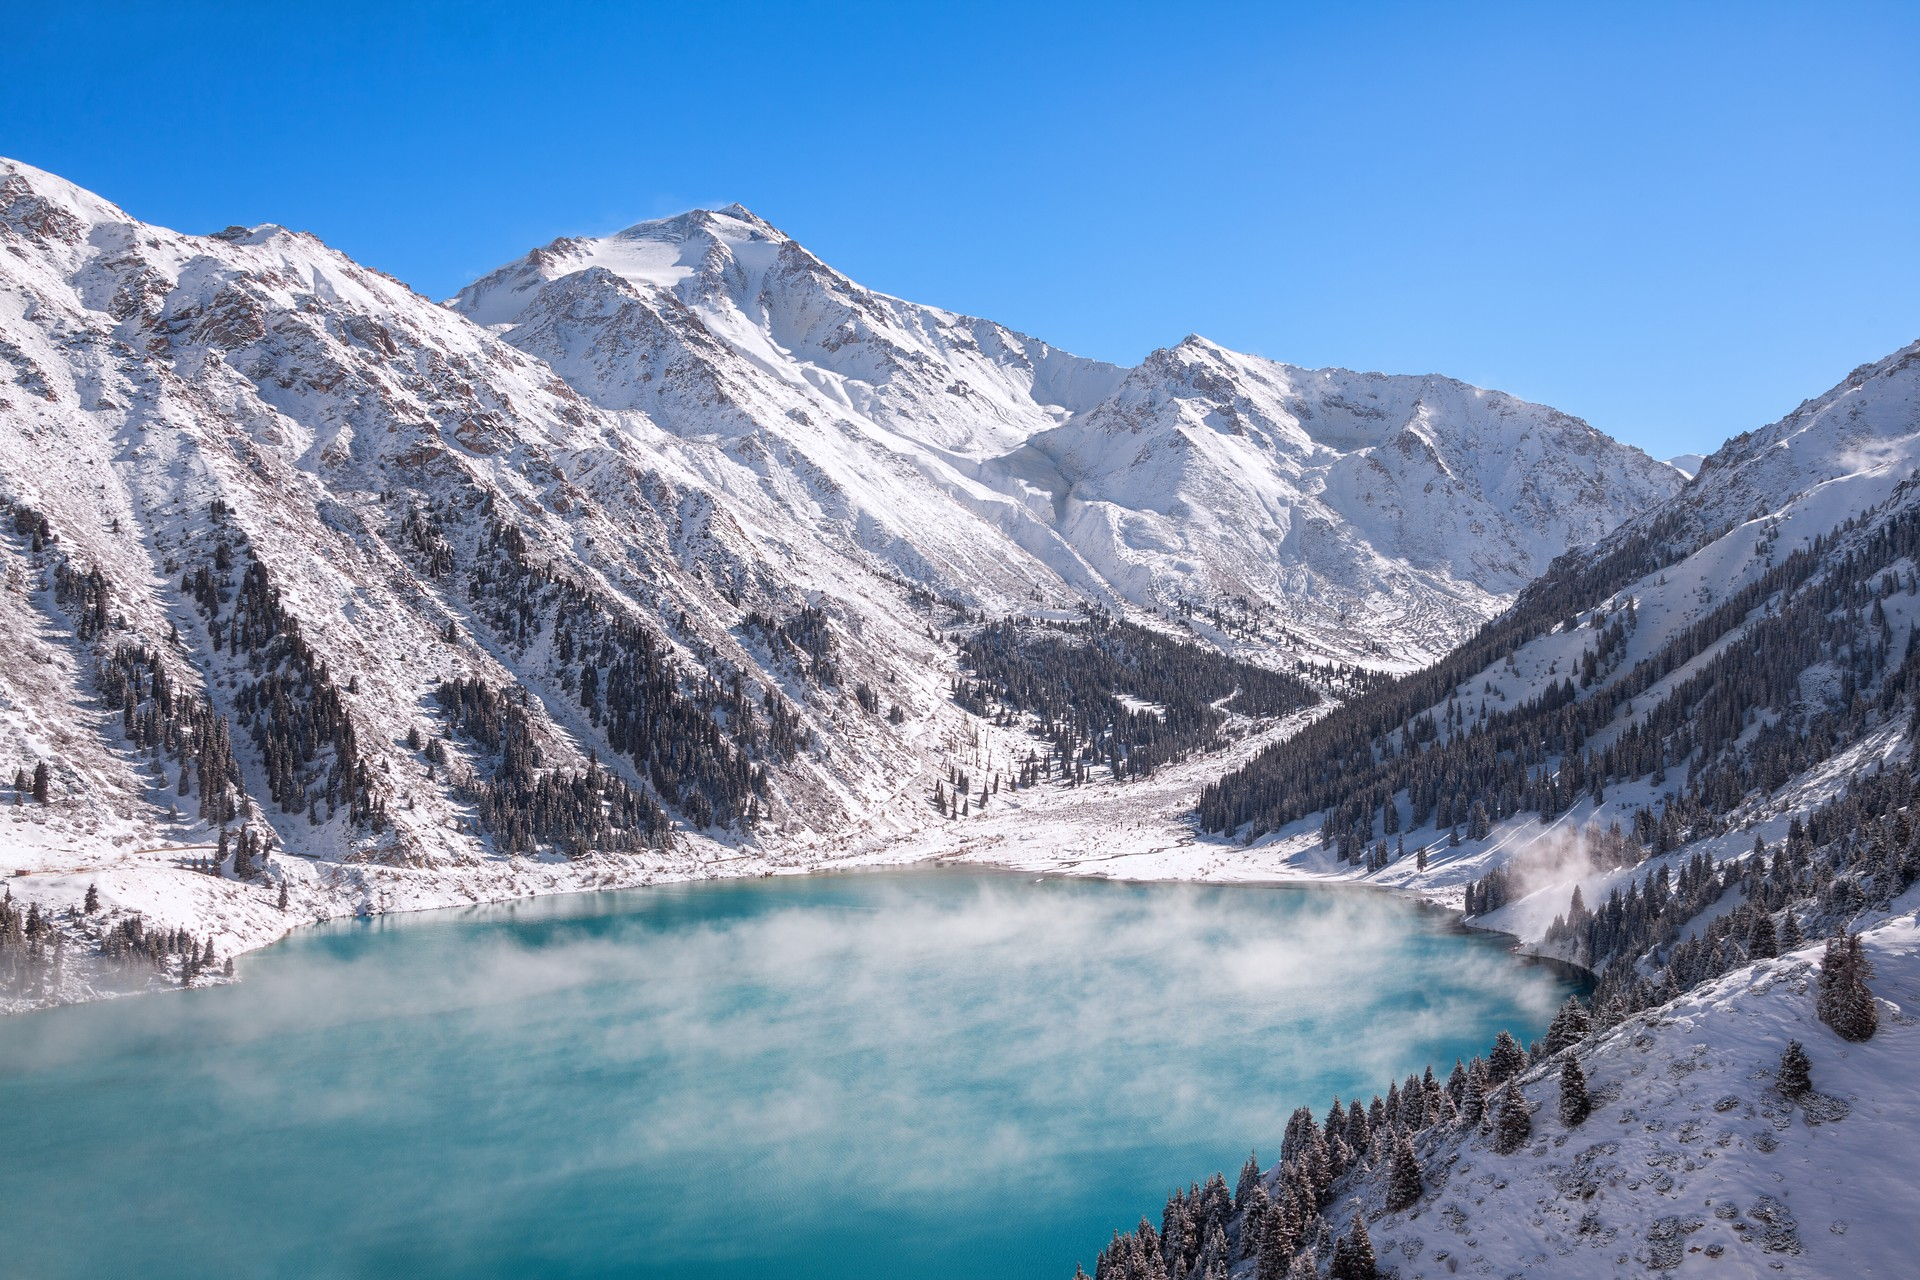 Big Almaty Lake in Tien Shan mountains